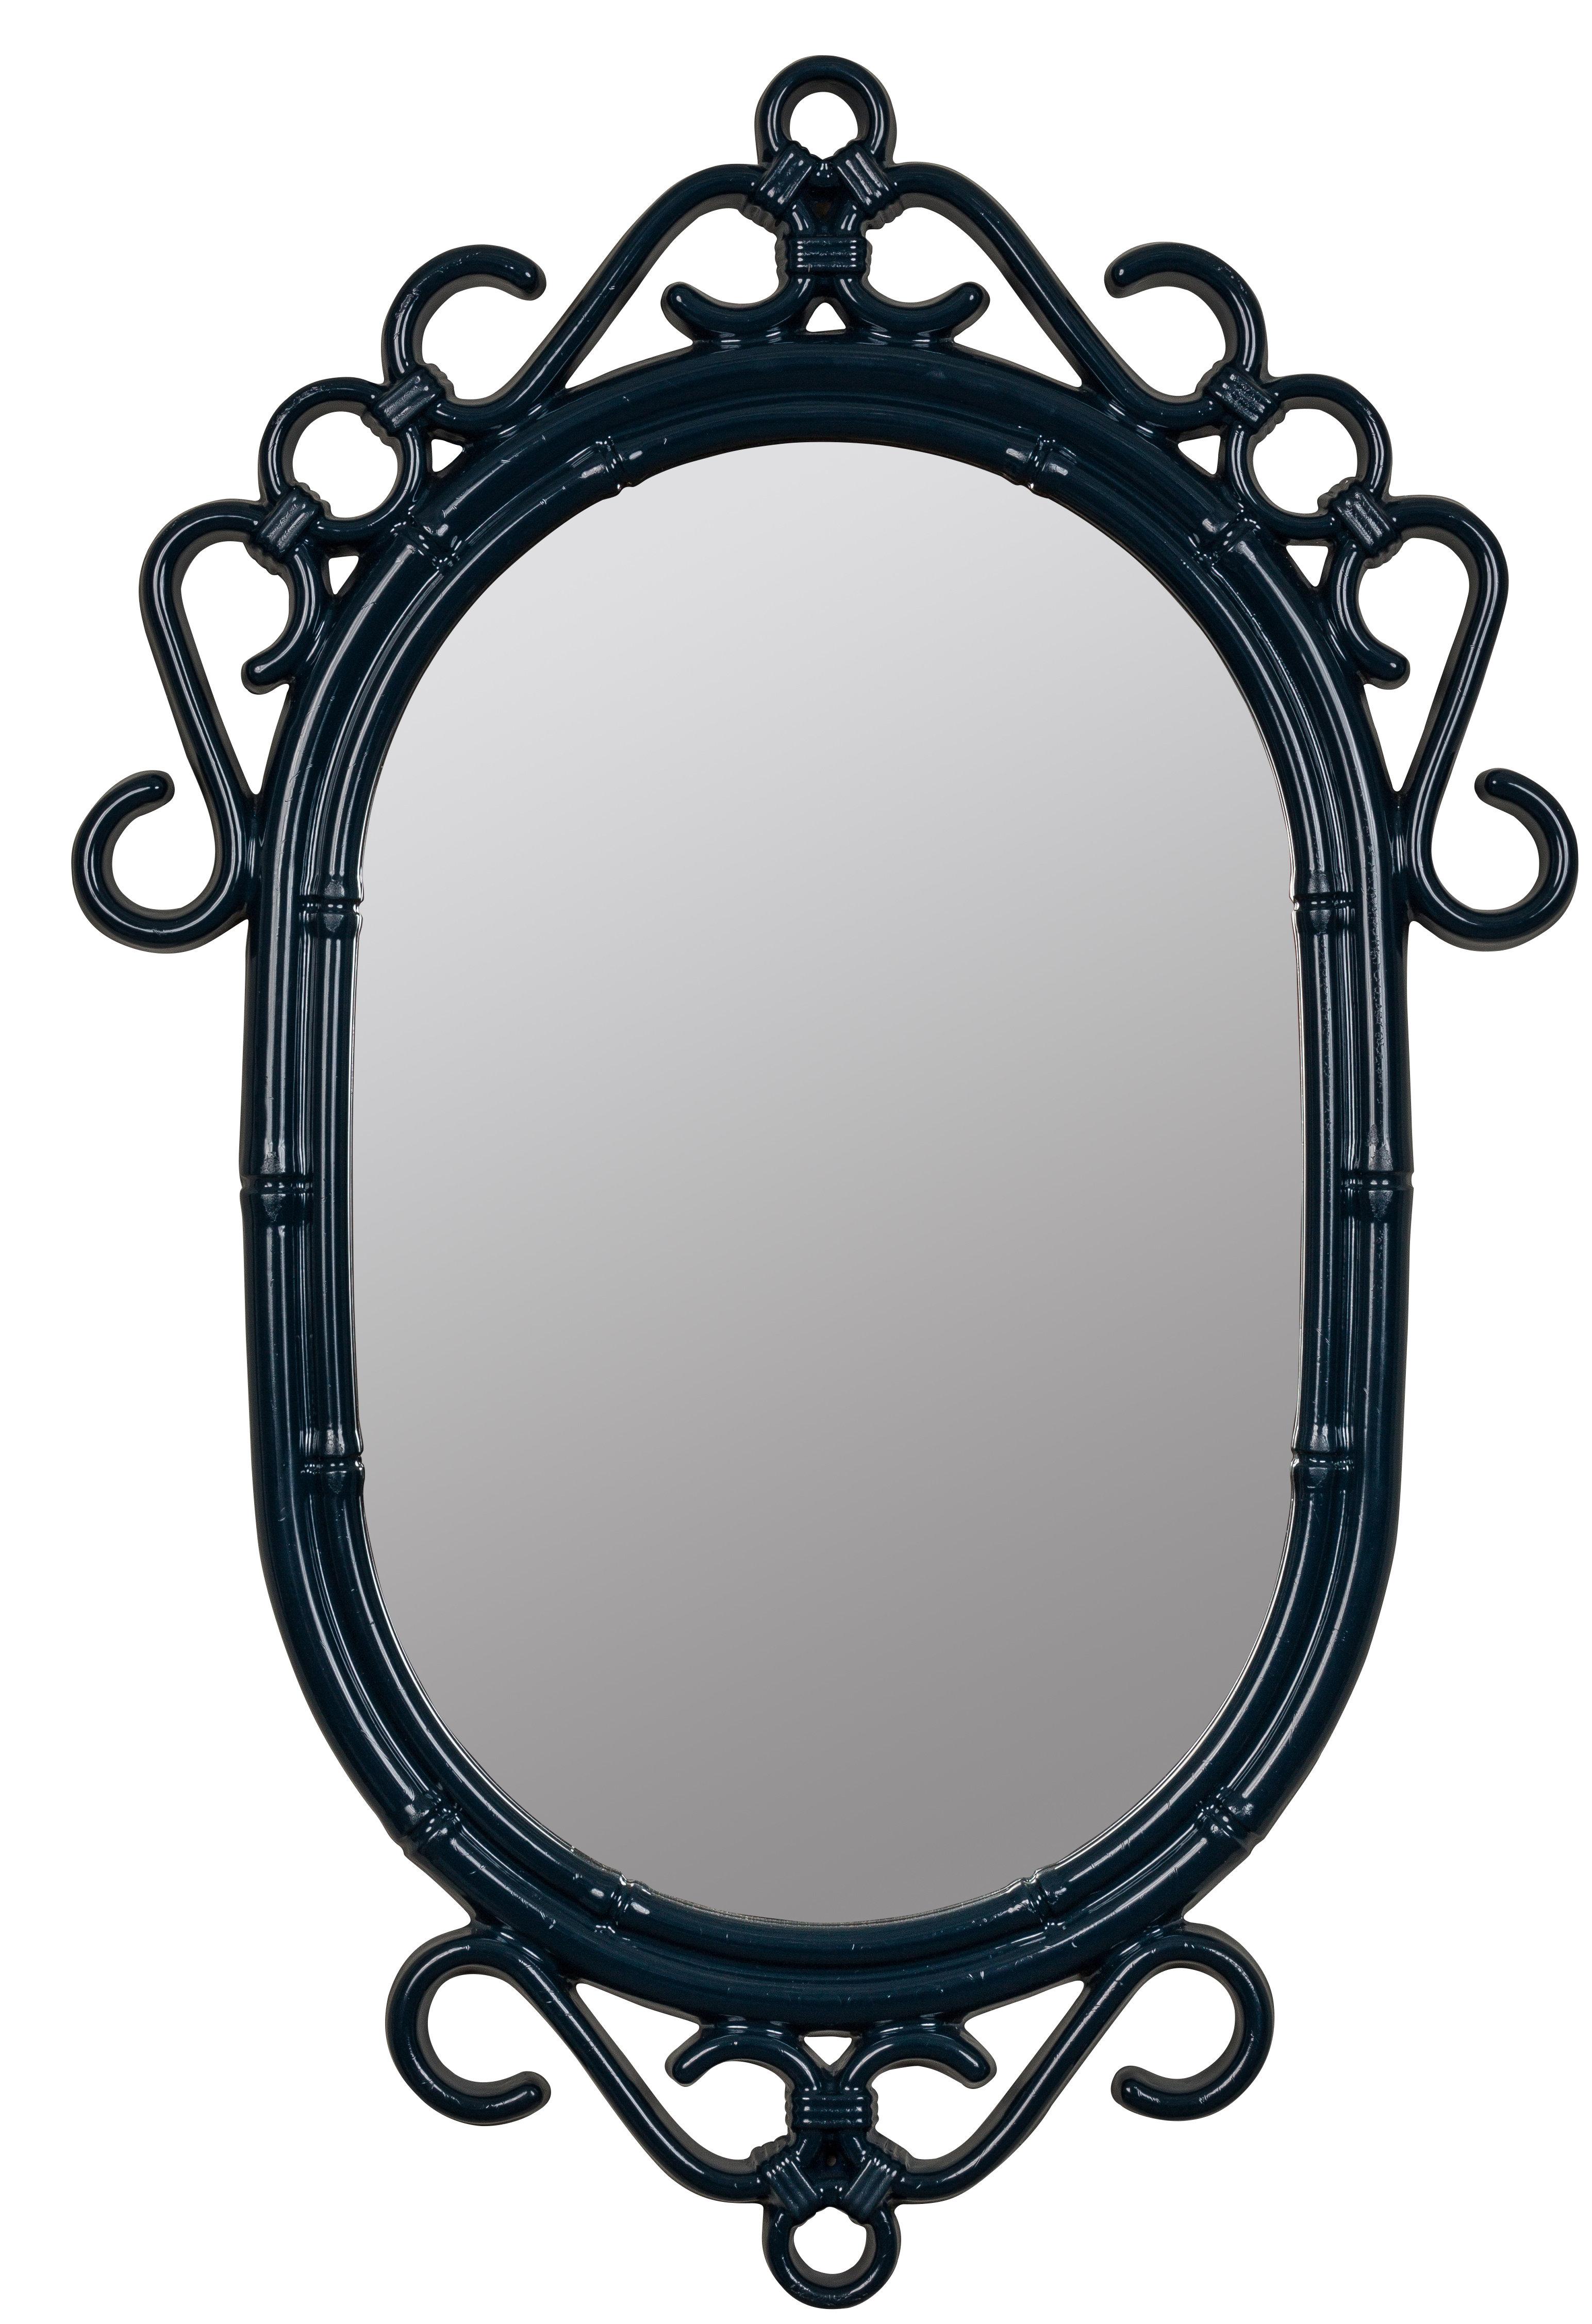 Accent Wall Mirrors | Joss & Main Regarding Gaunts Earthcott Modern & Contemporary Beveled Accent Mirrors (View 13 of 20)